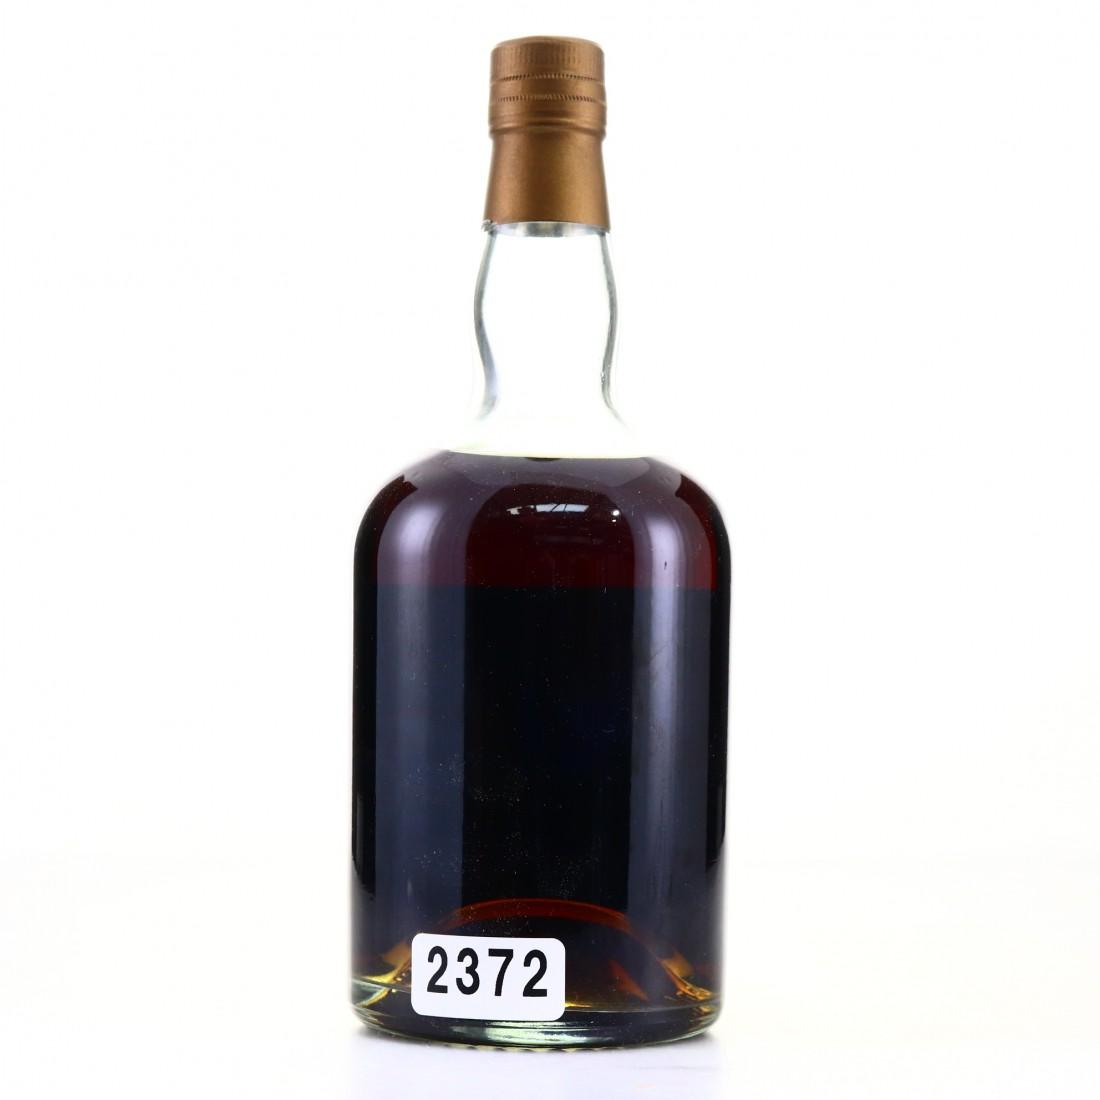 Springbank 1973 Cadenhead's 18 Year Old Rum Butt